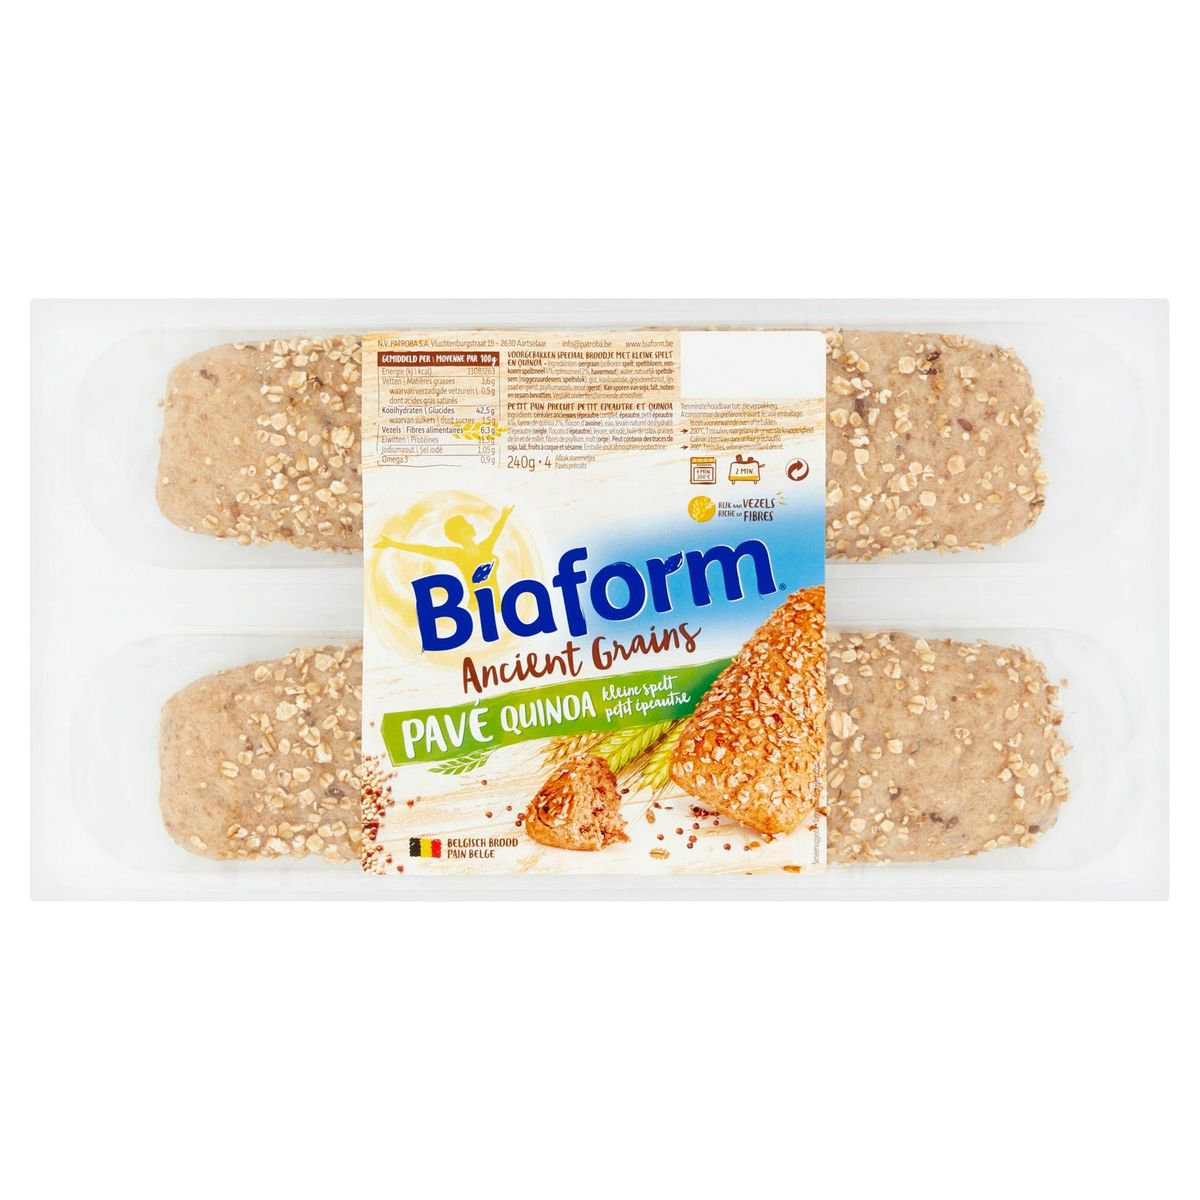 Biaform Ancient Grains Pavé Quinoa Kleine Spelt 4 Stuks 240 g